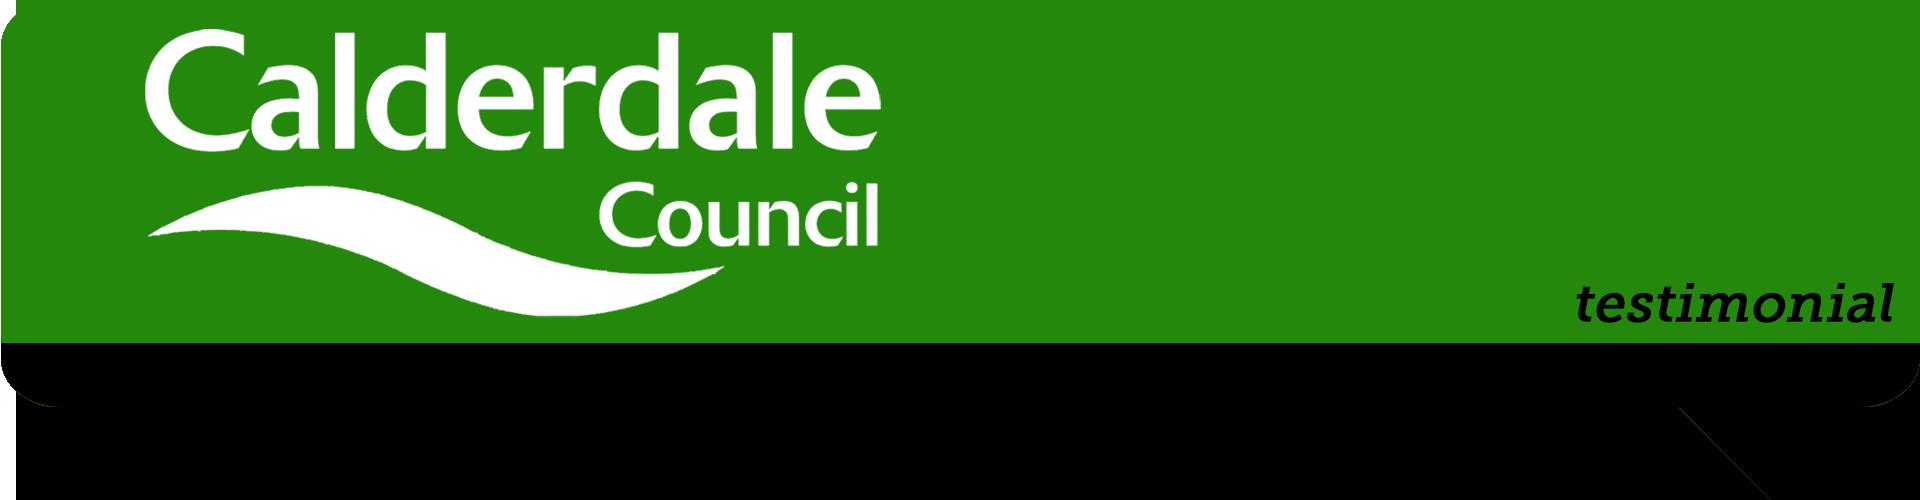 calderdale council logo in speech bubble